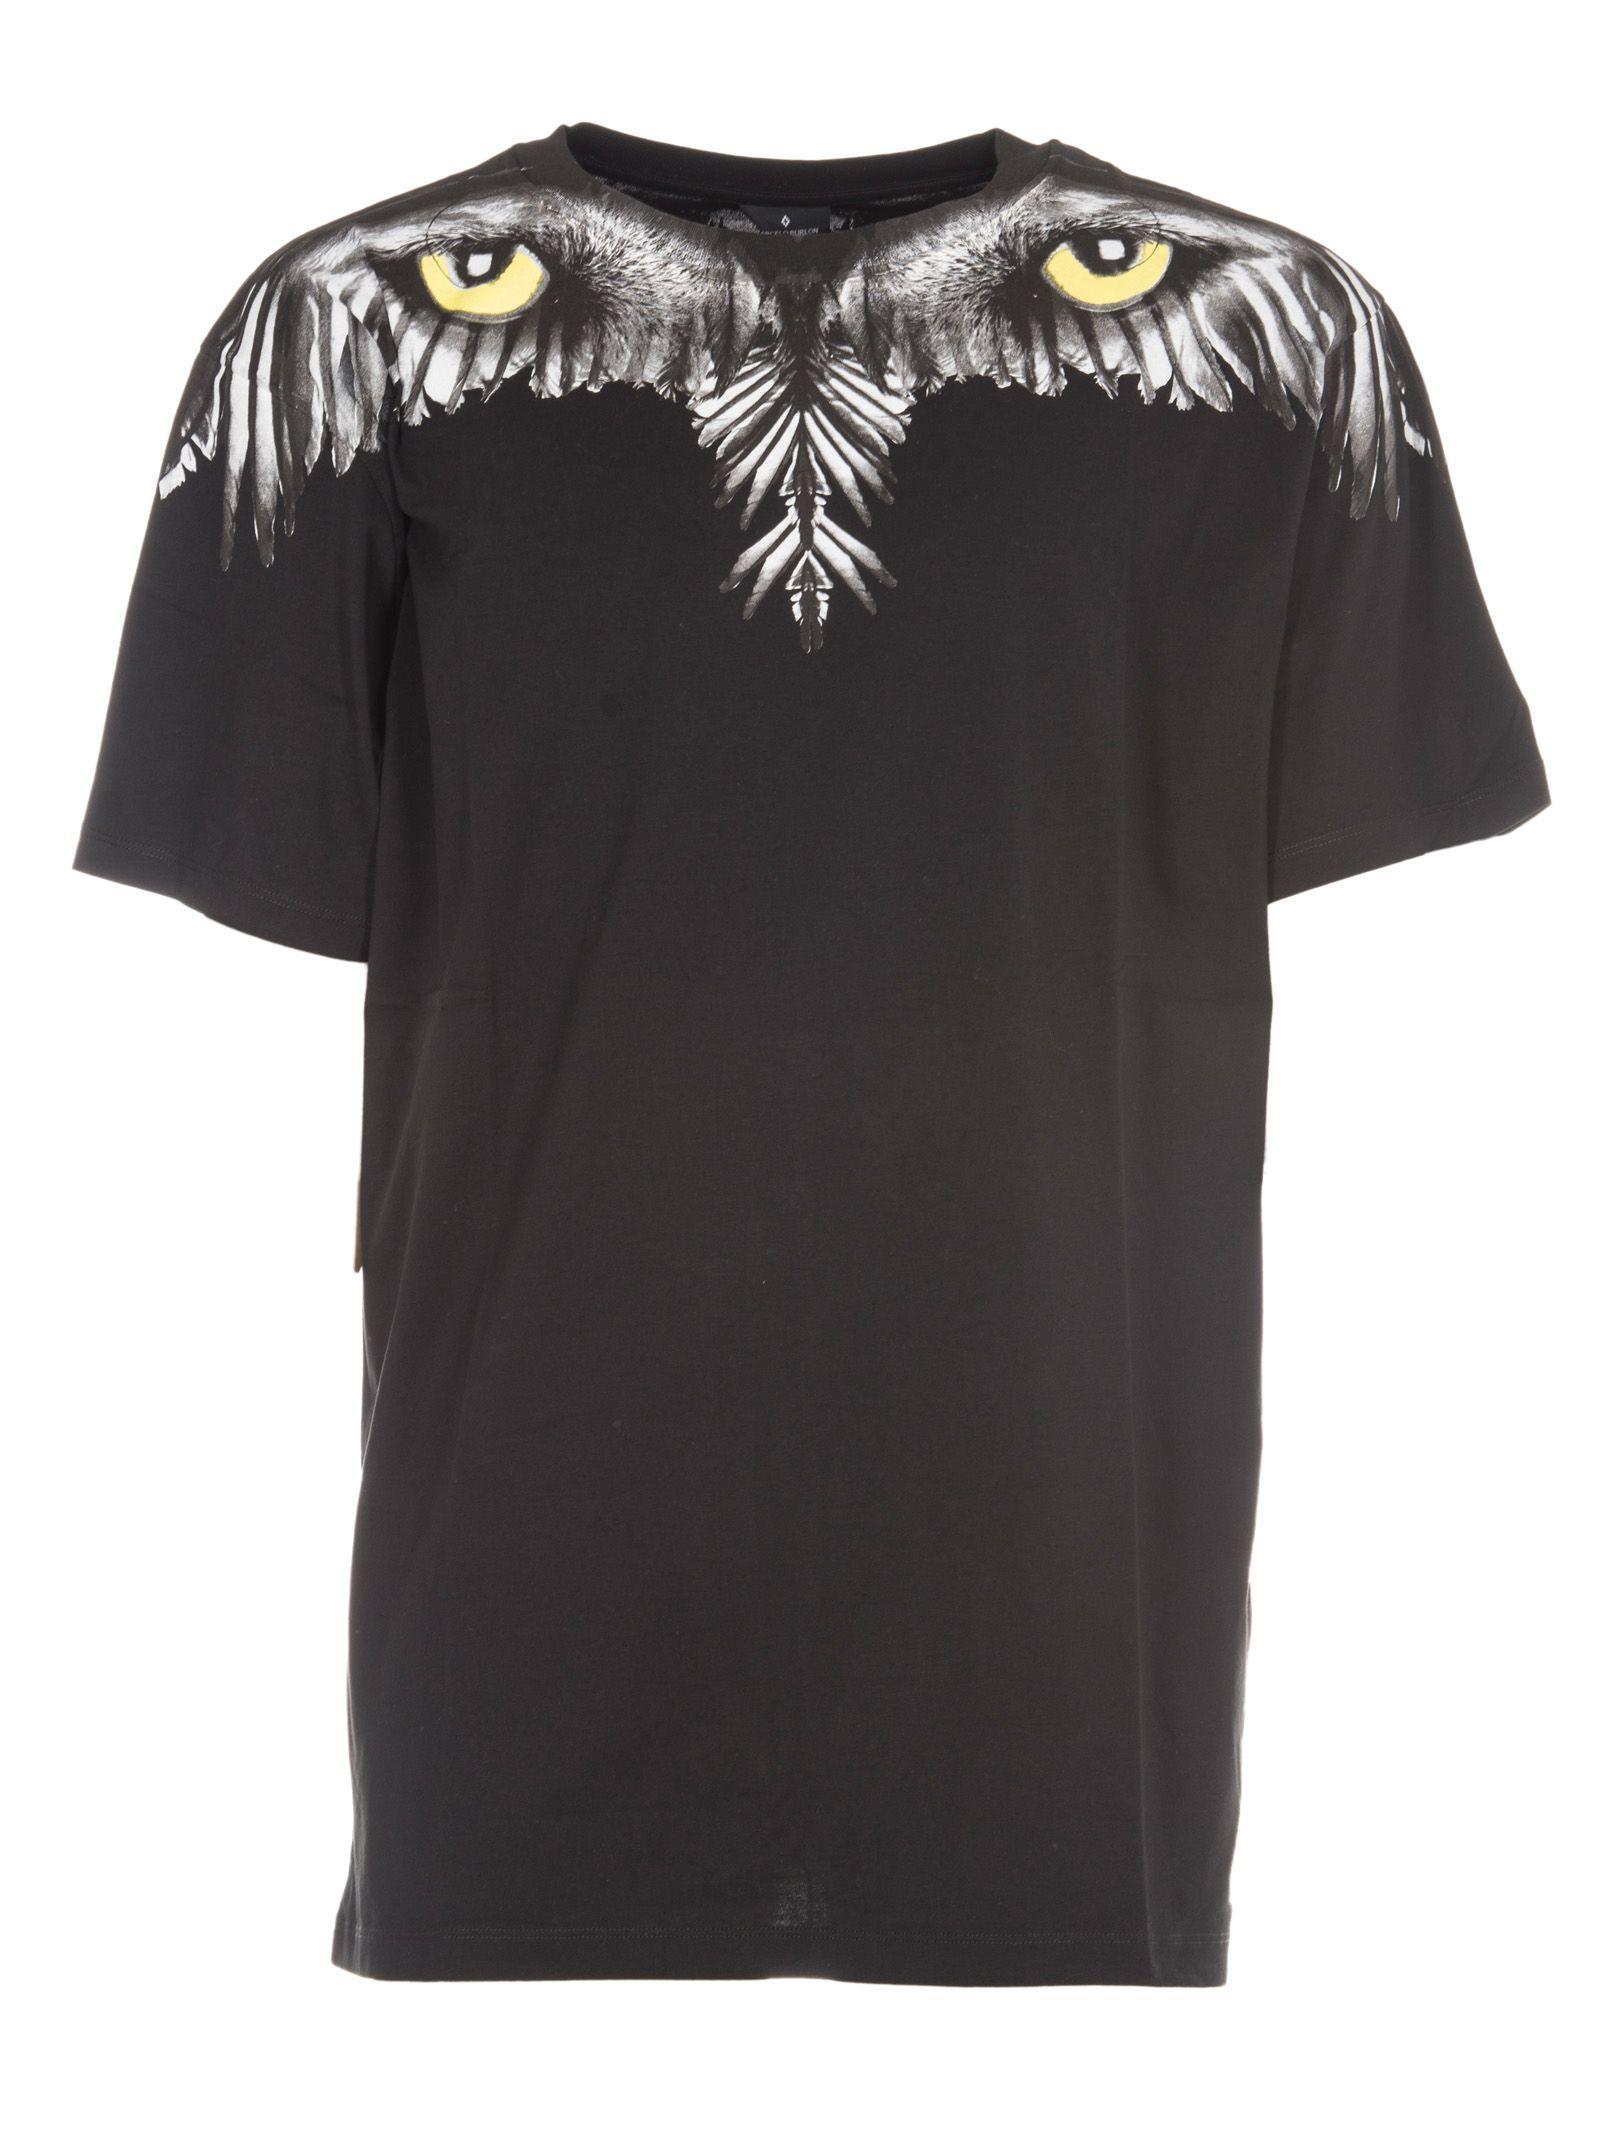 Marcelo Burlon Eye Wing T-shirt